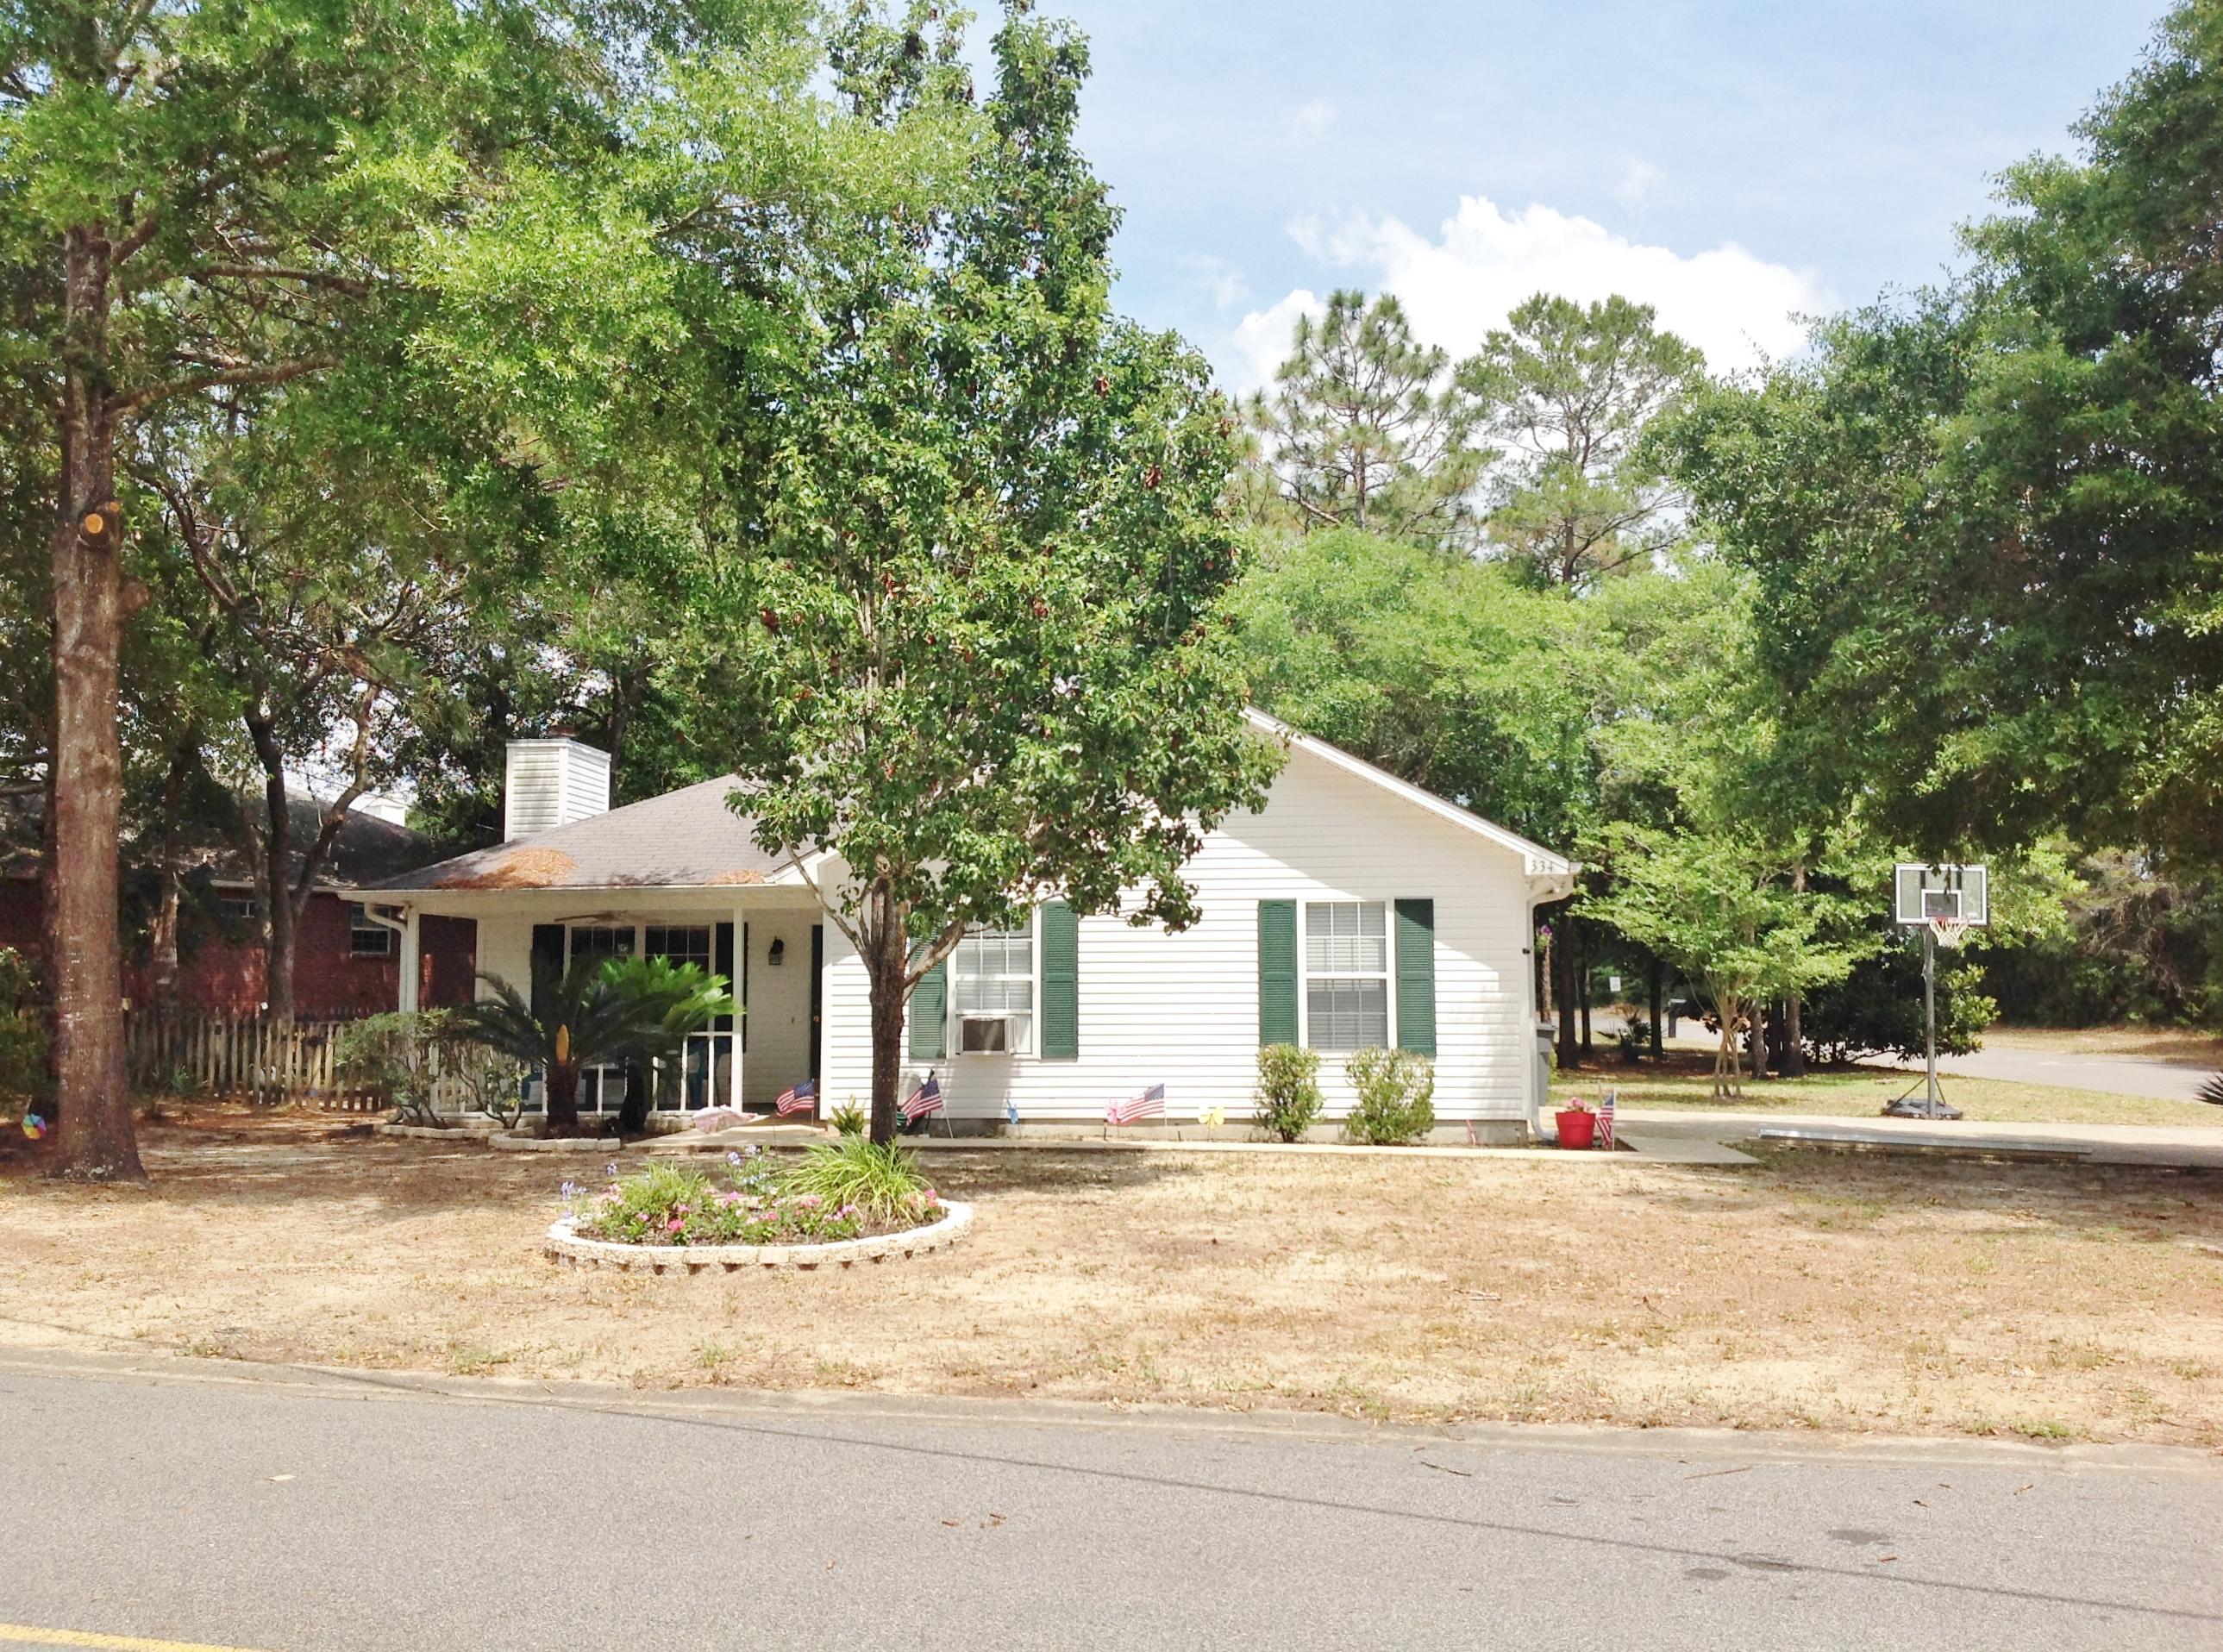 334  Jackson Circle, Valparaiso in Okaloosa County, FL 32580 Home for Sale